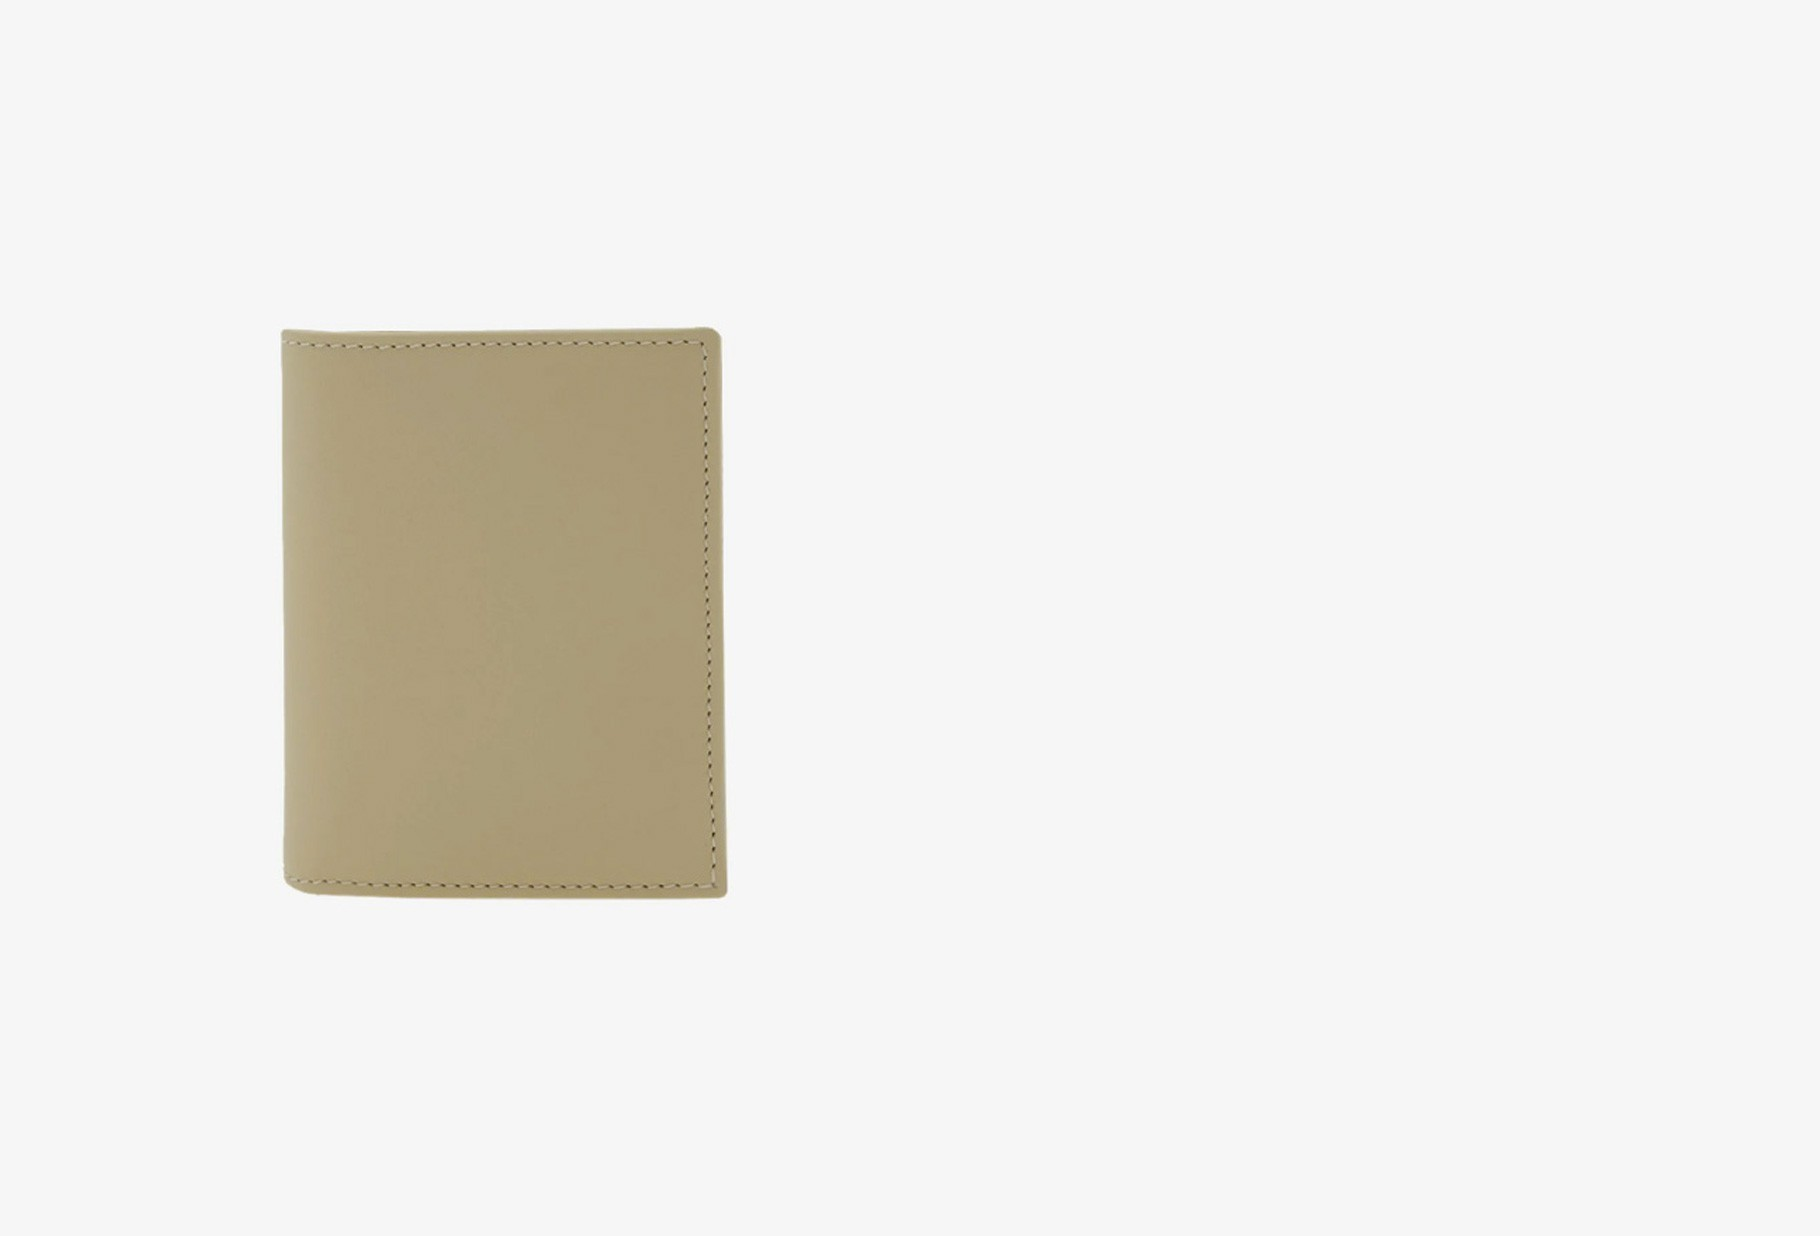 COMME DES GARÇONS WALLETS / Cdg leather wallet classic Sa0641 white